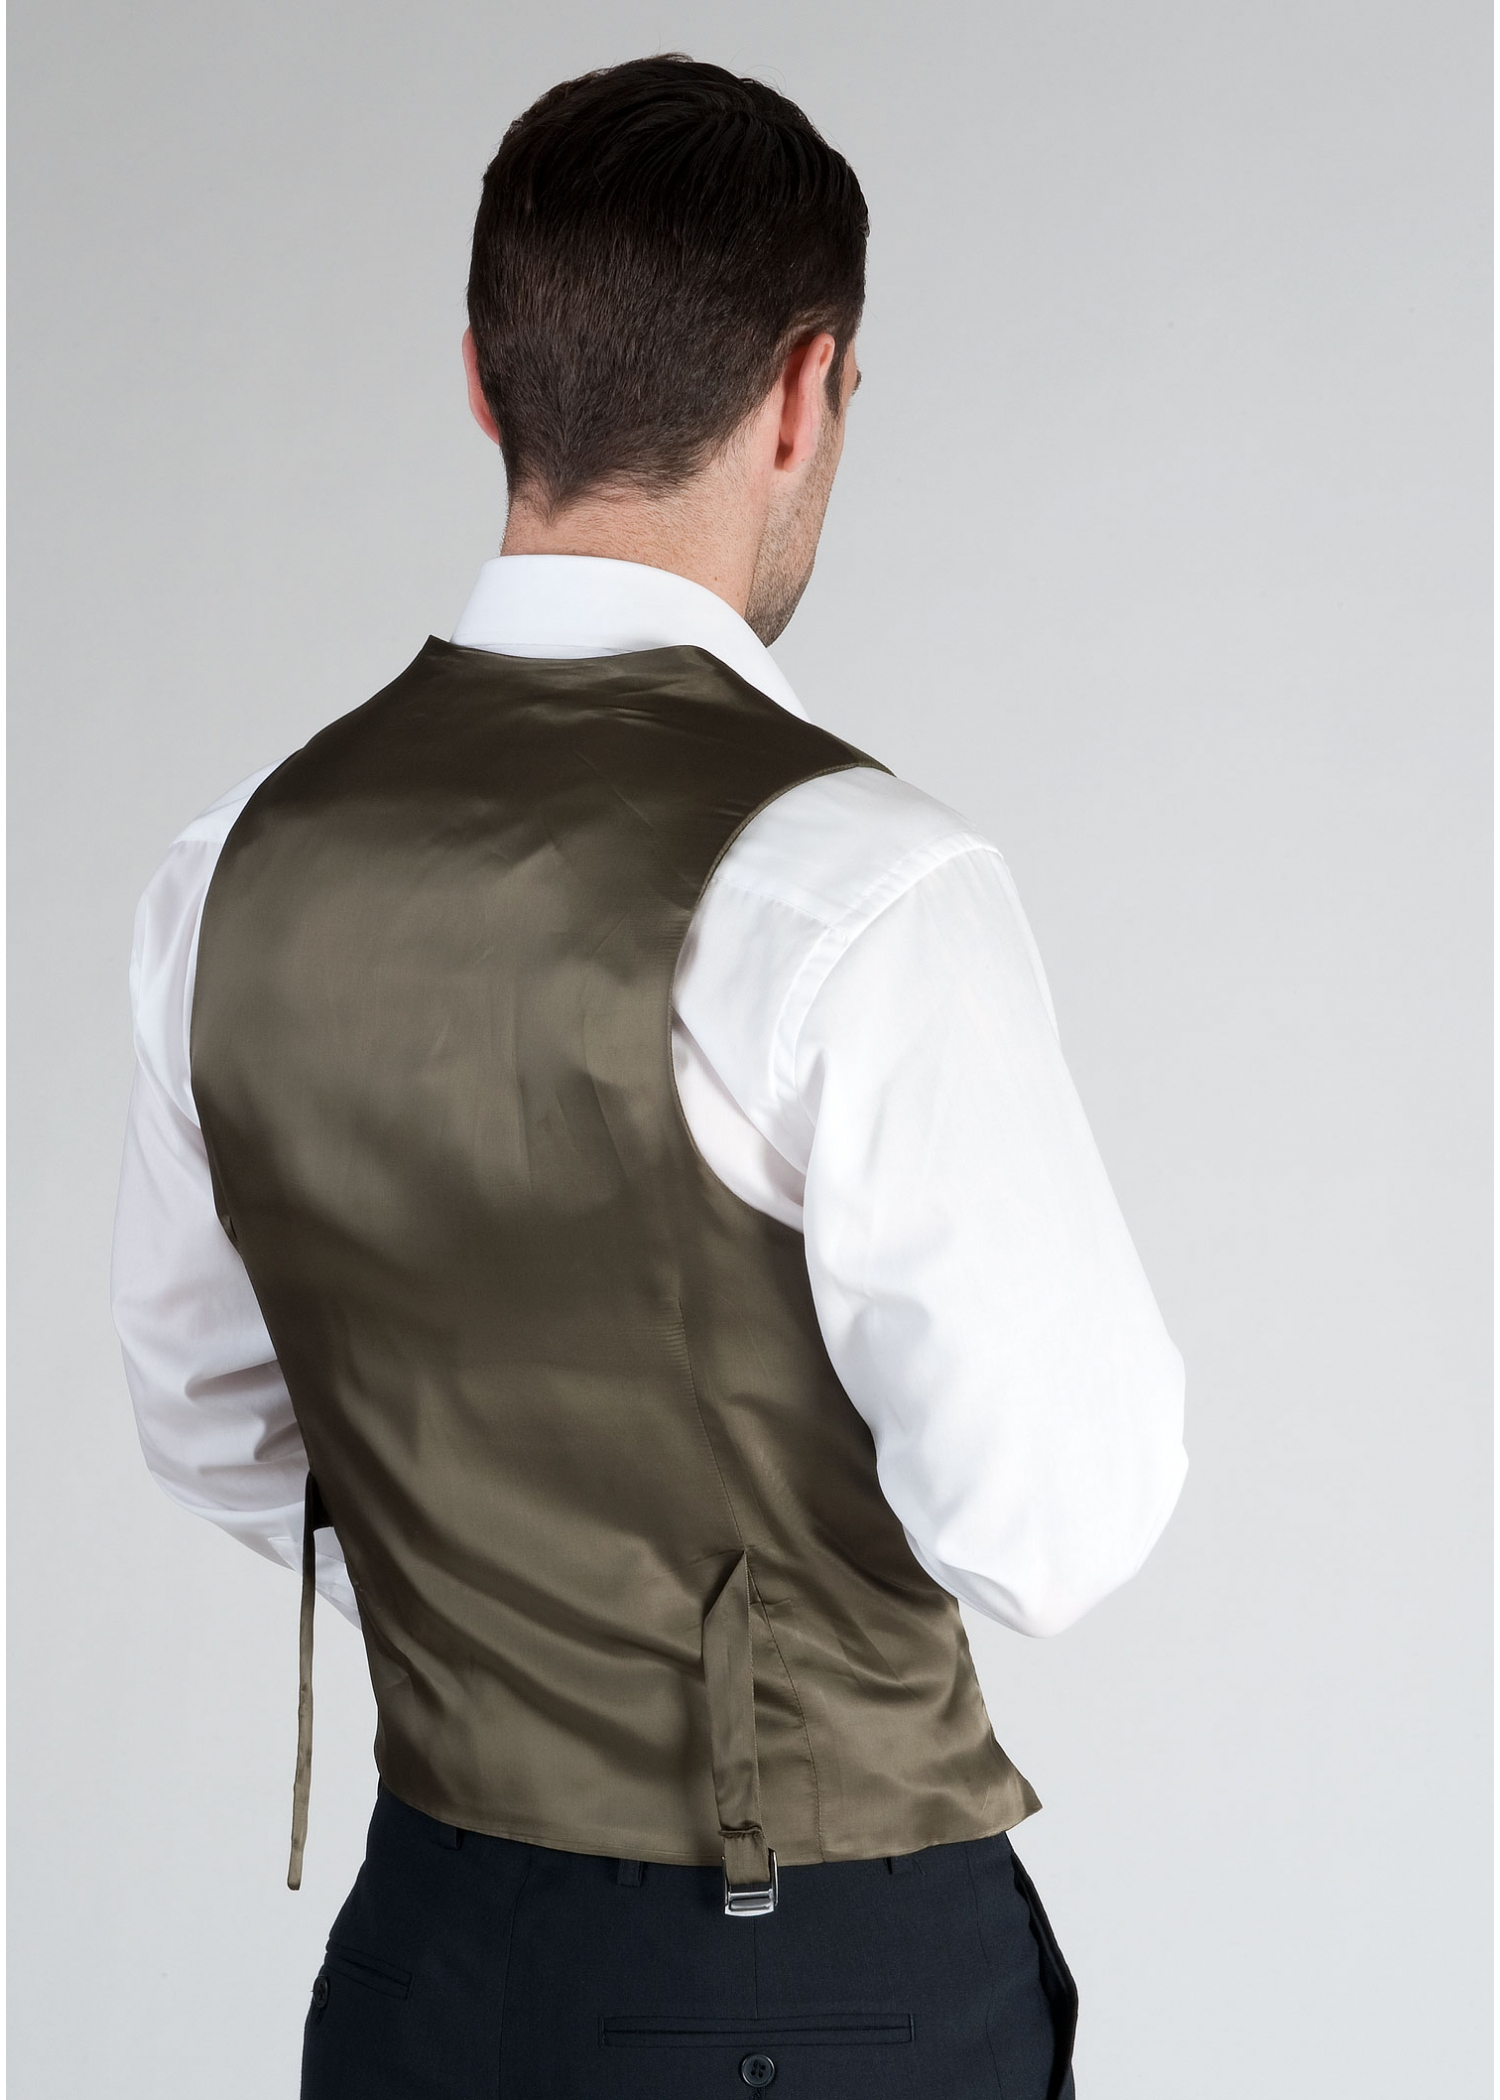 Green waistcoat